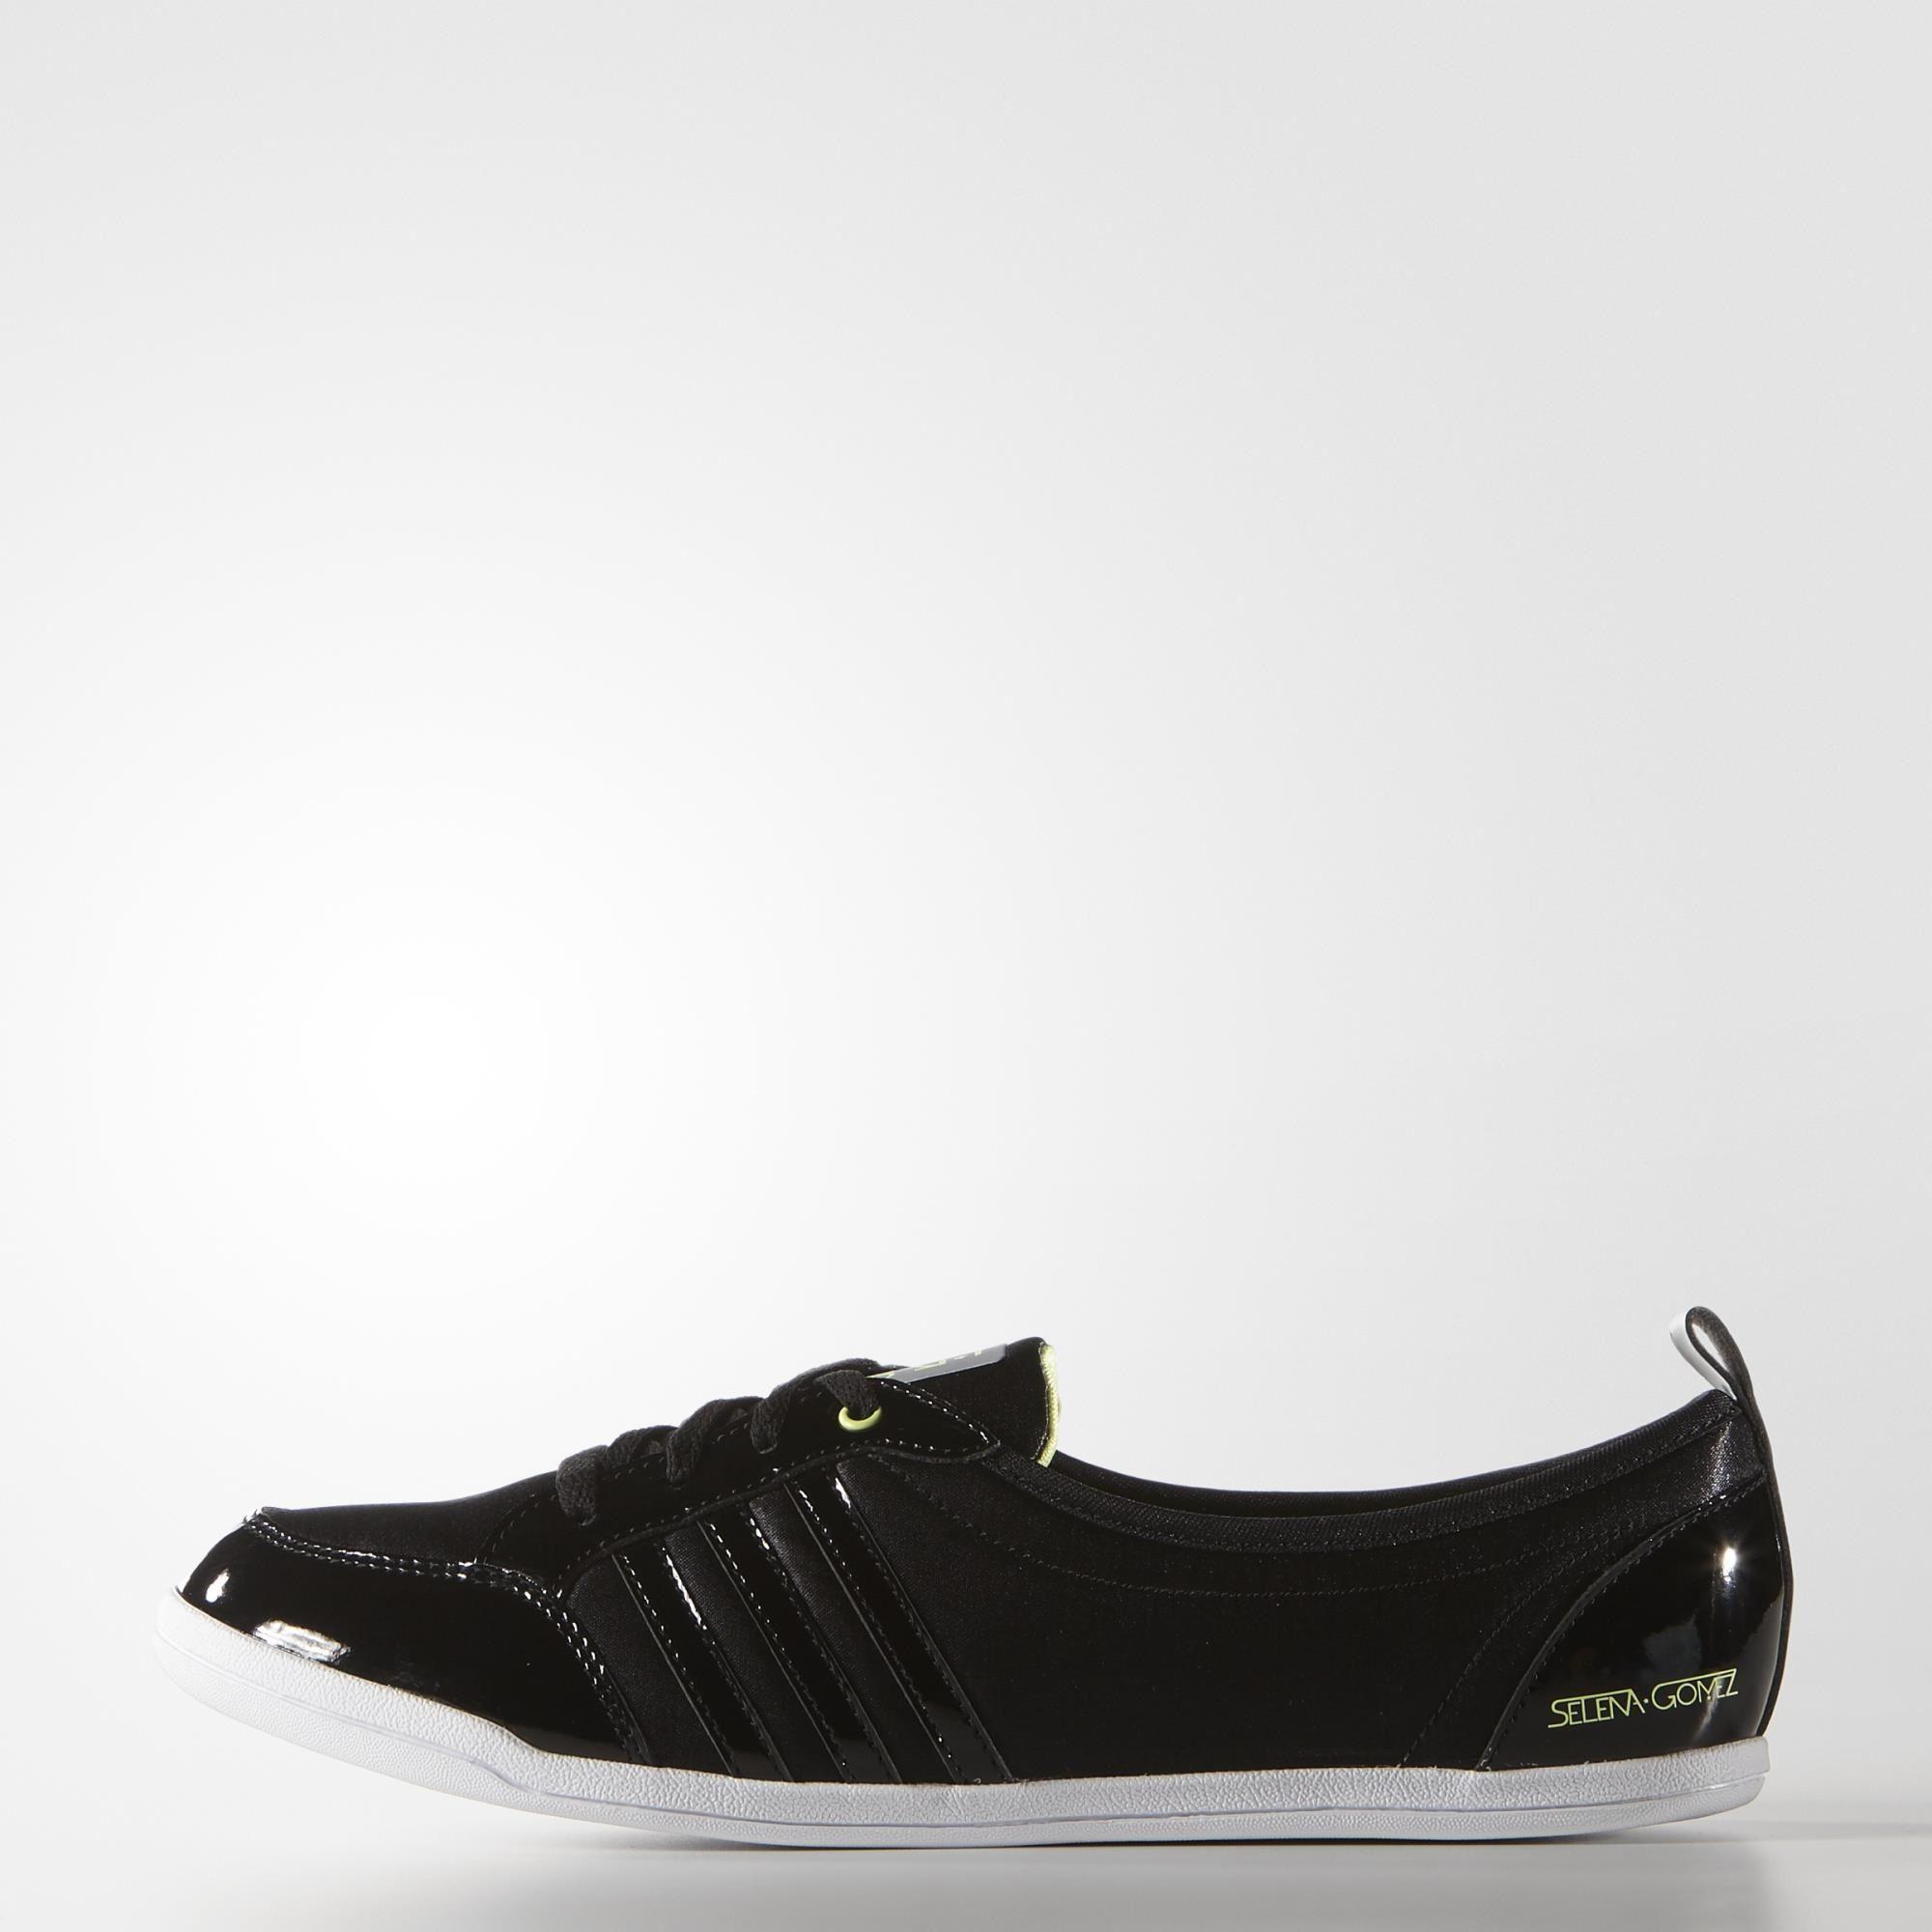 Vente Pas Ligne Adidas En Cher Piona Galerie Neo France Yby7gv6f